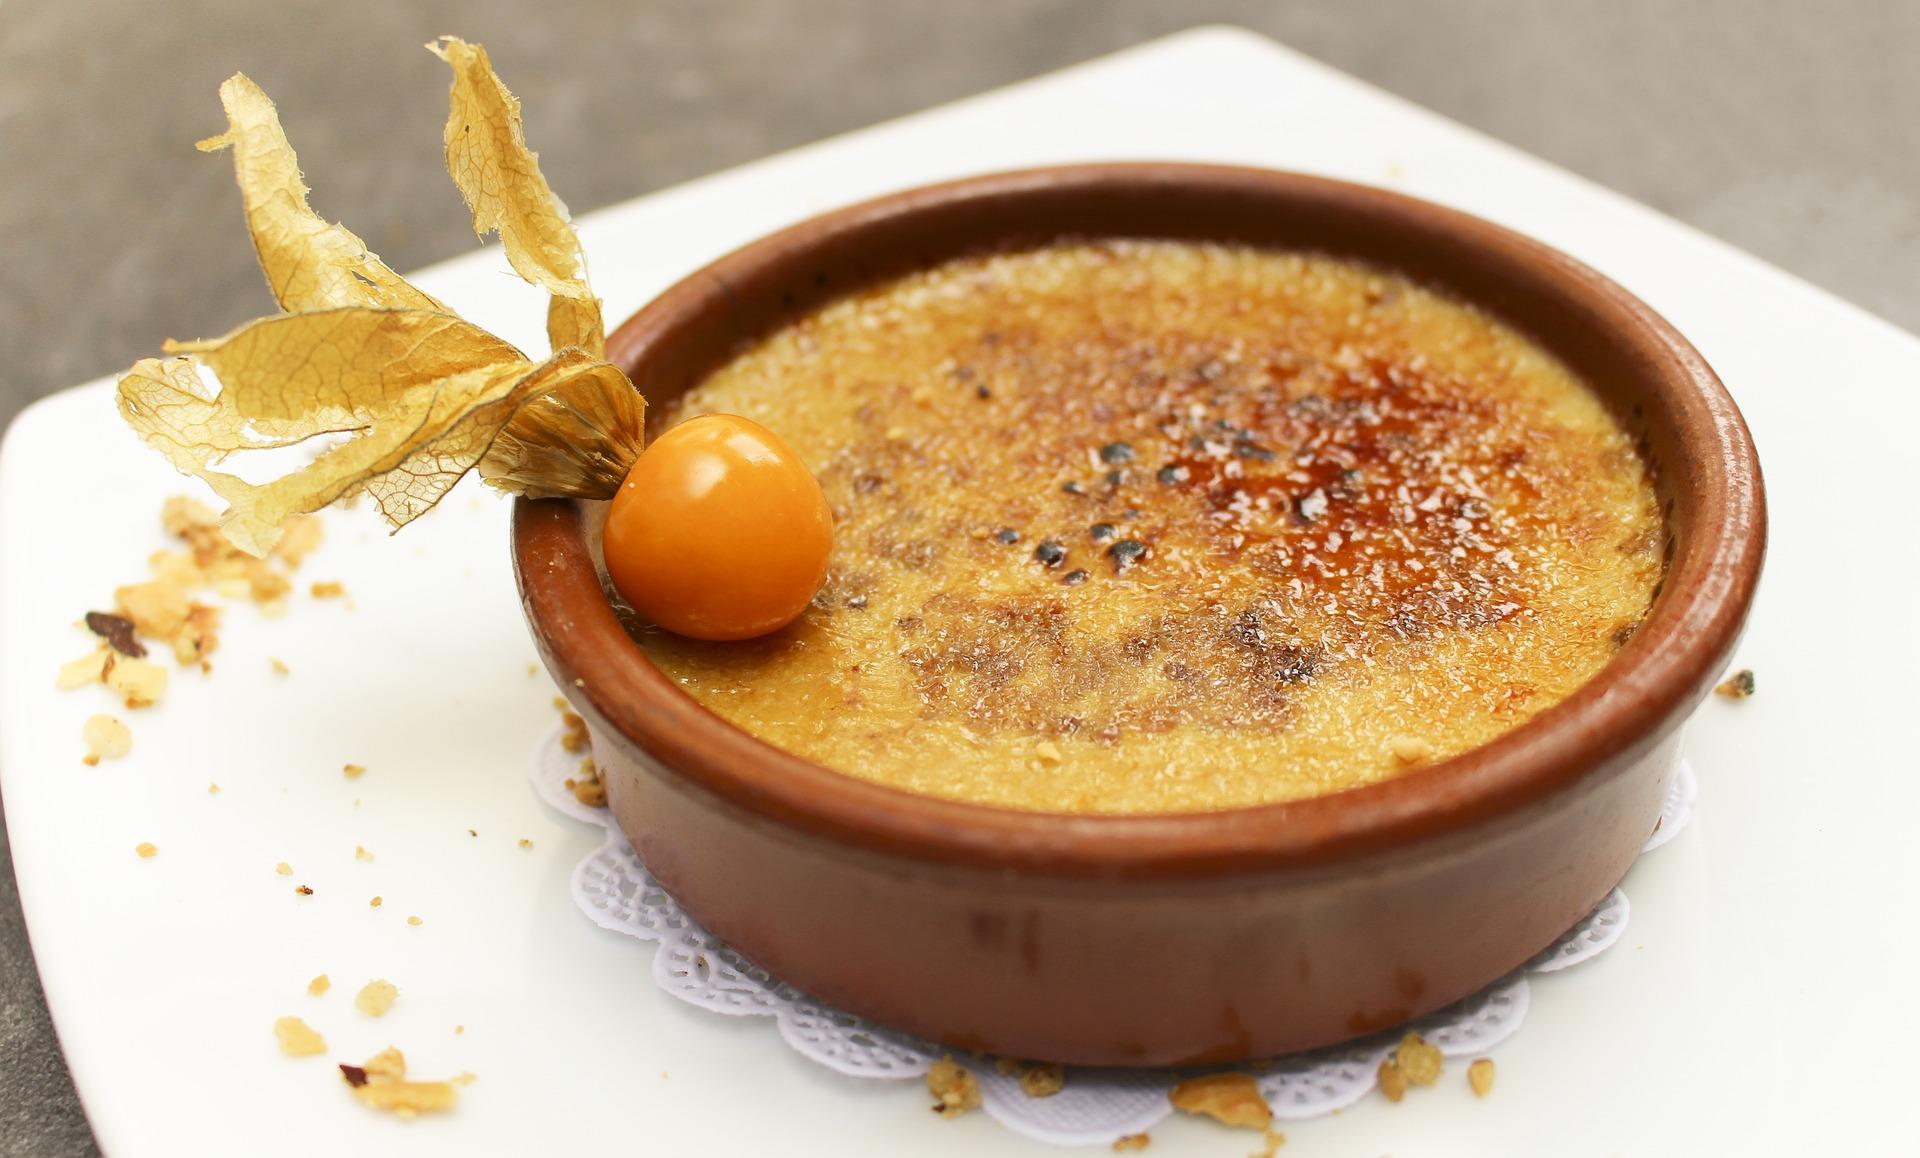 Crostata crème brûlée di Damiano Carrara